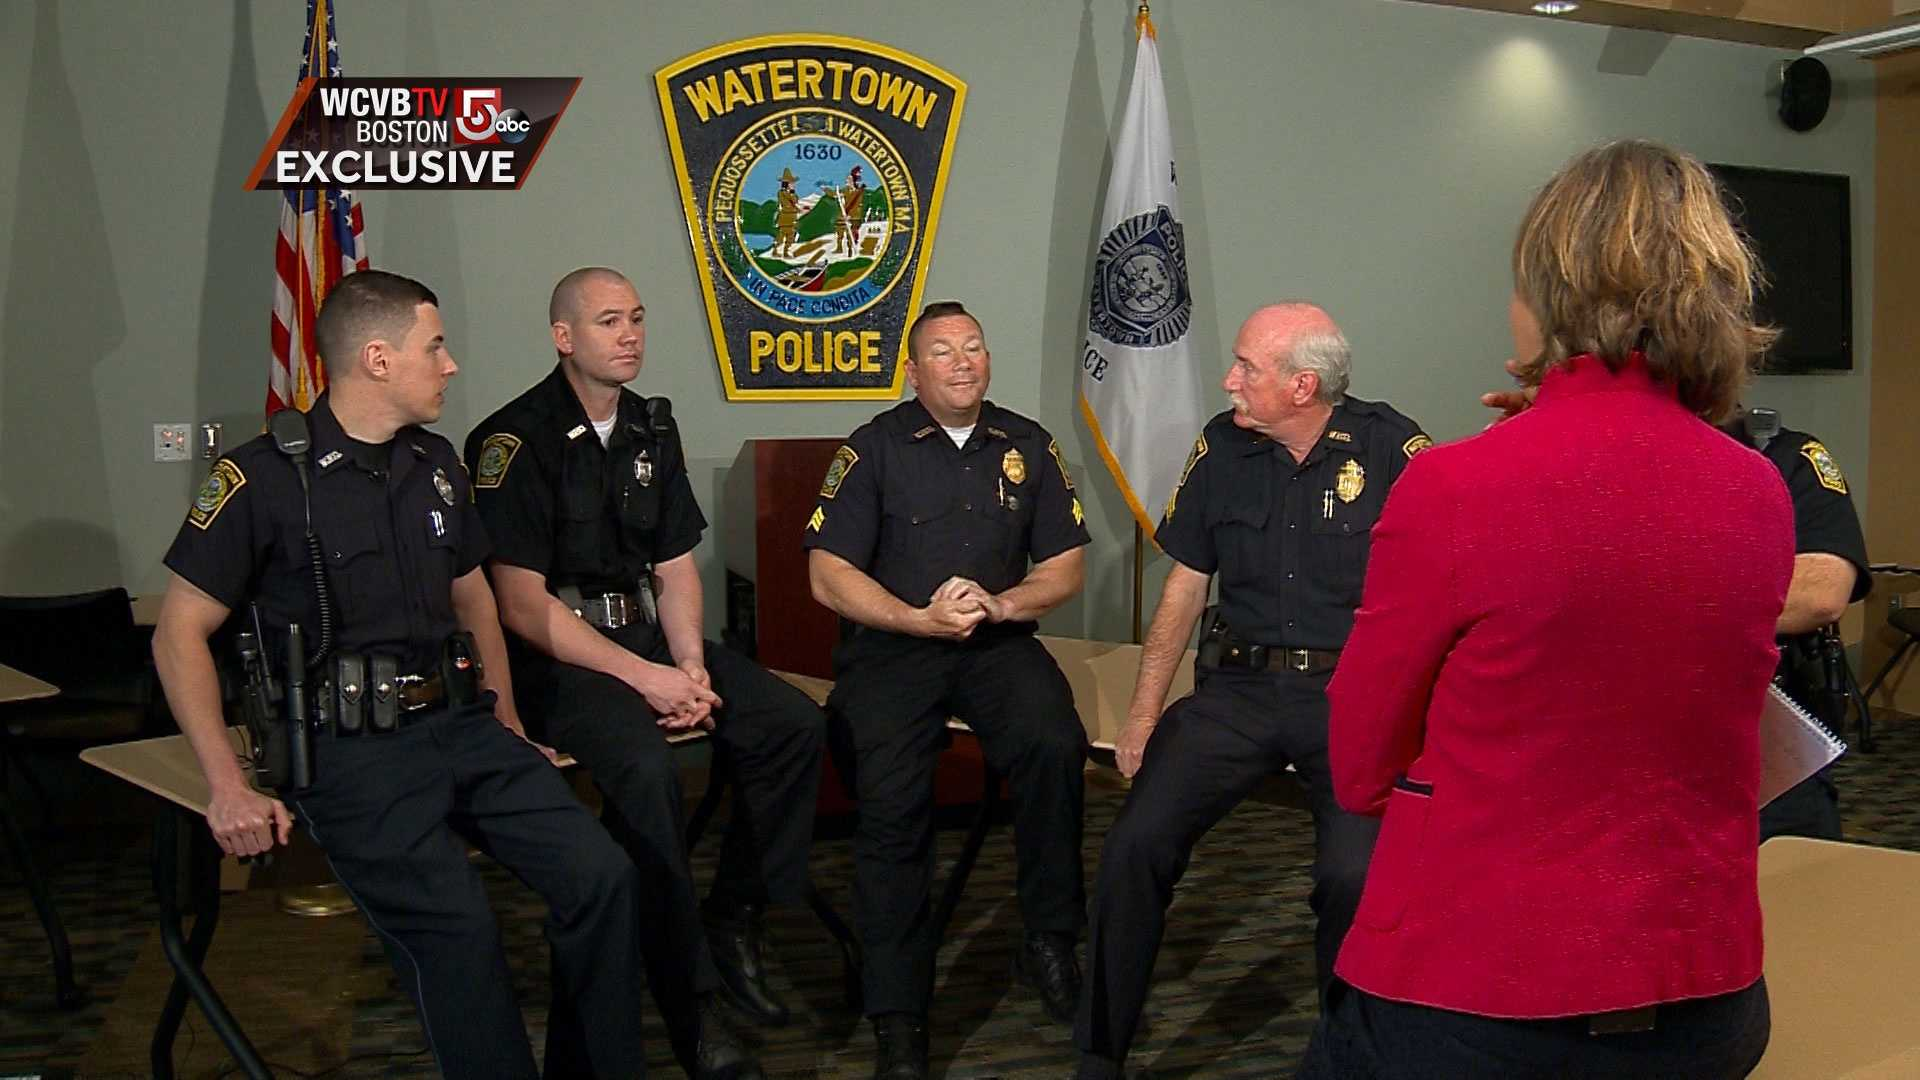 Watertown officers EXCLUSIVE bug